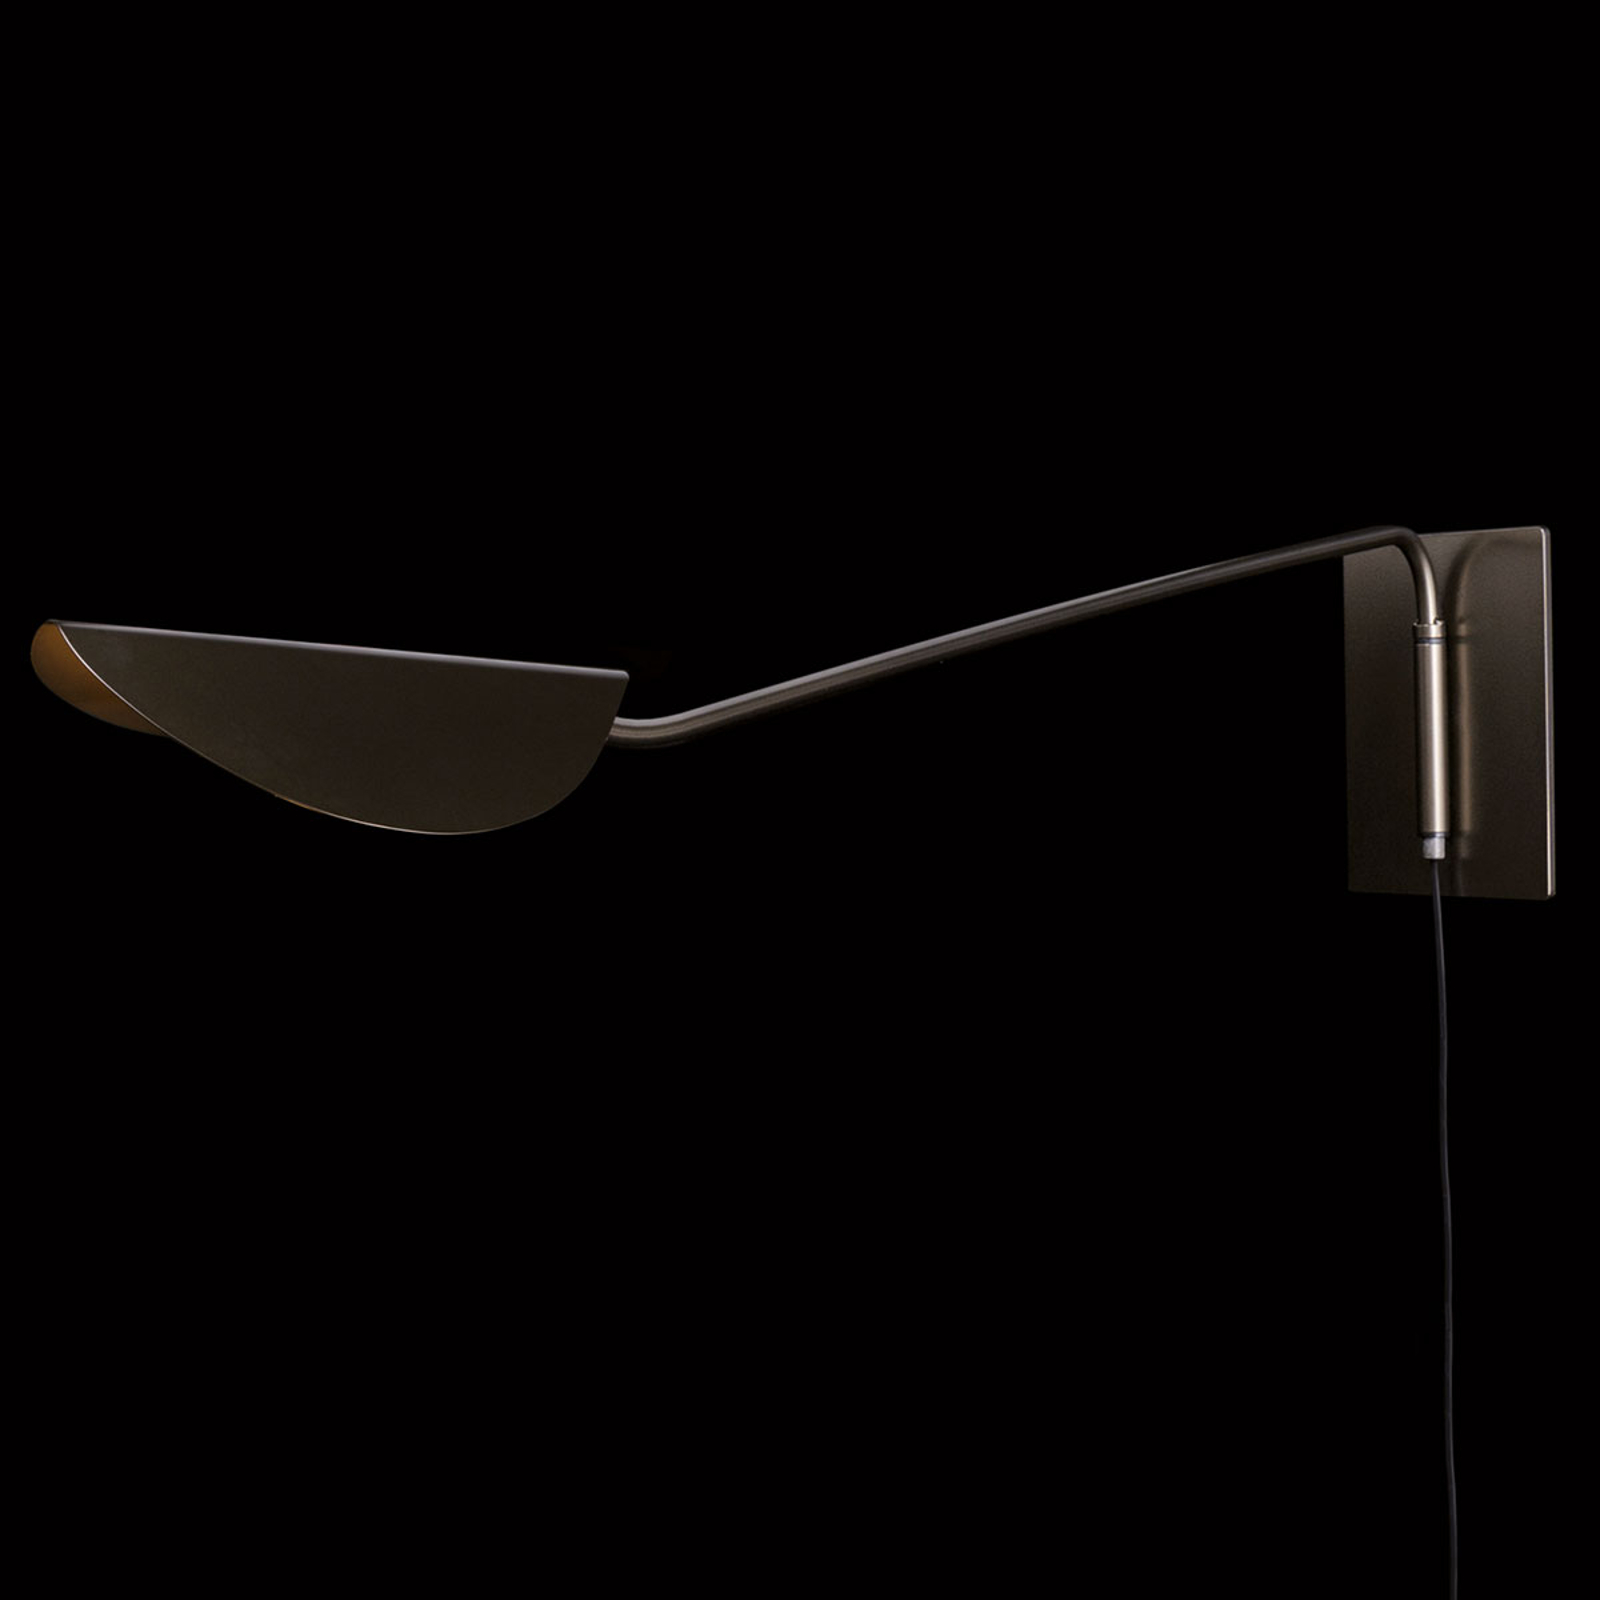 Oluce Plume applique - profondeur 80cm